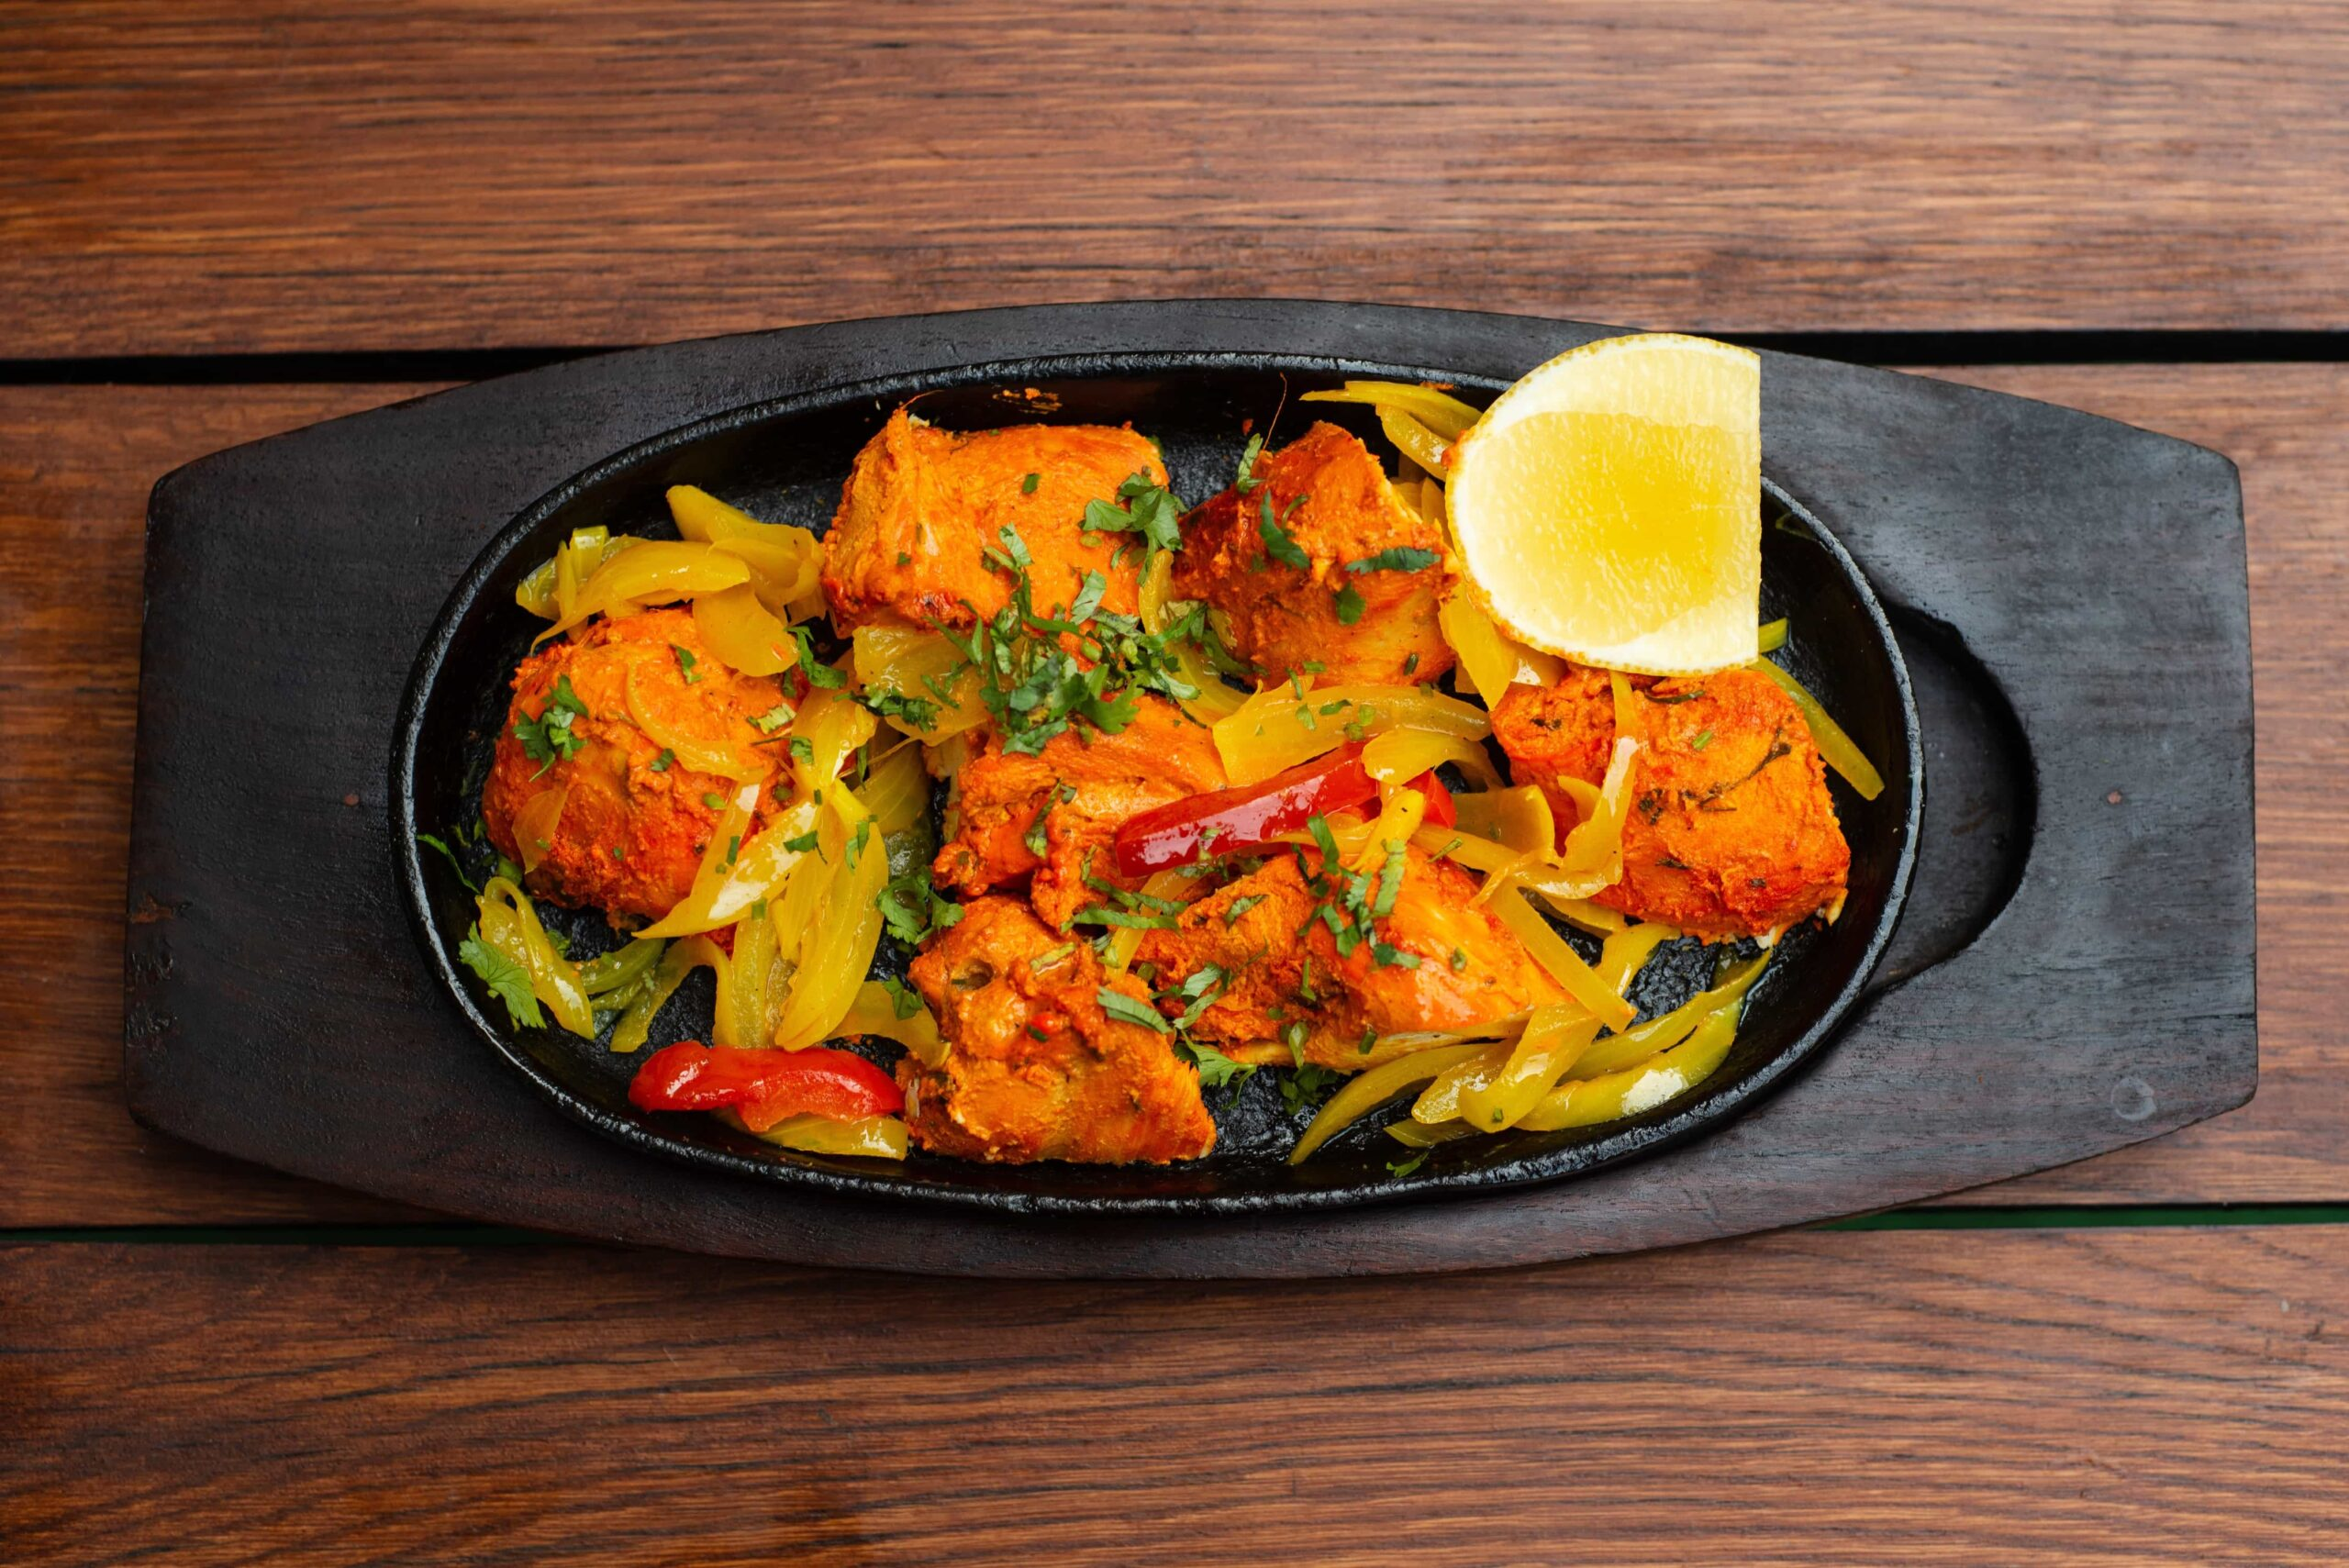 Tandoori chicken (photo: ArtificialOG, Pixabay)